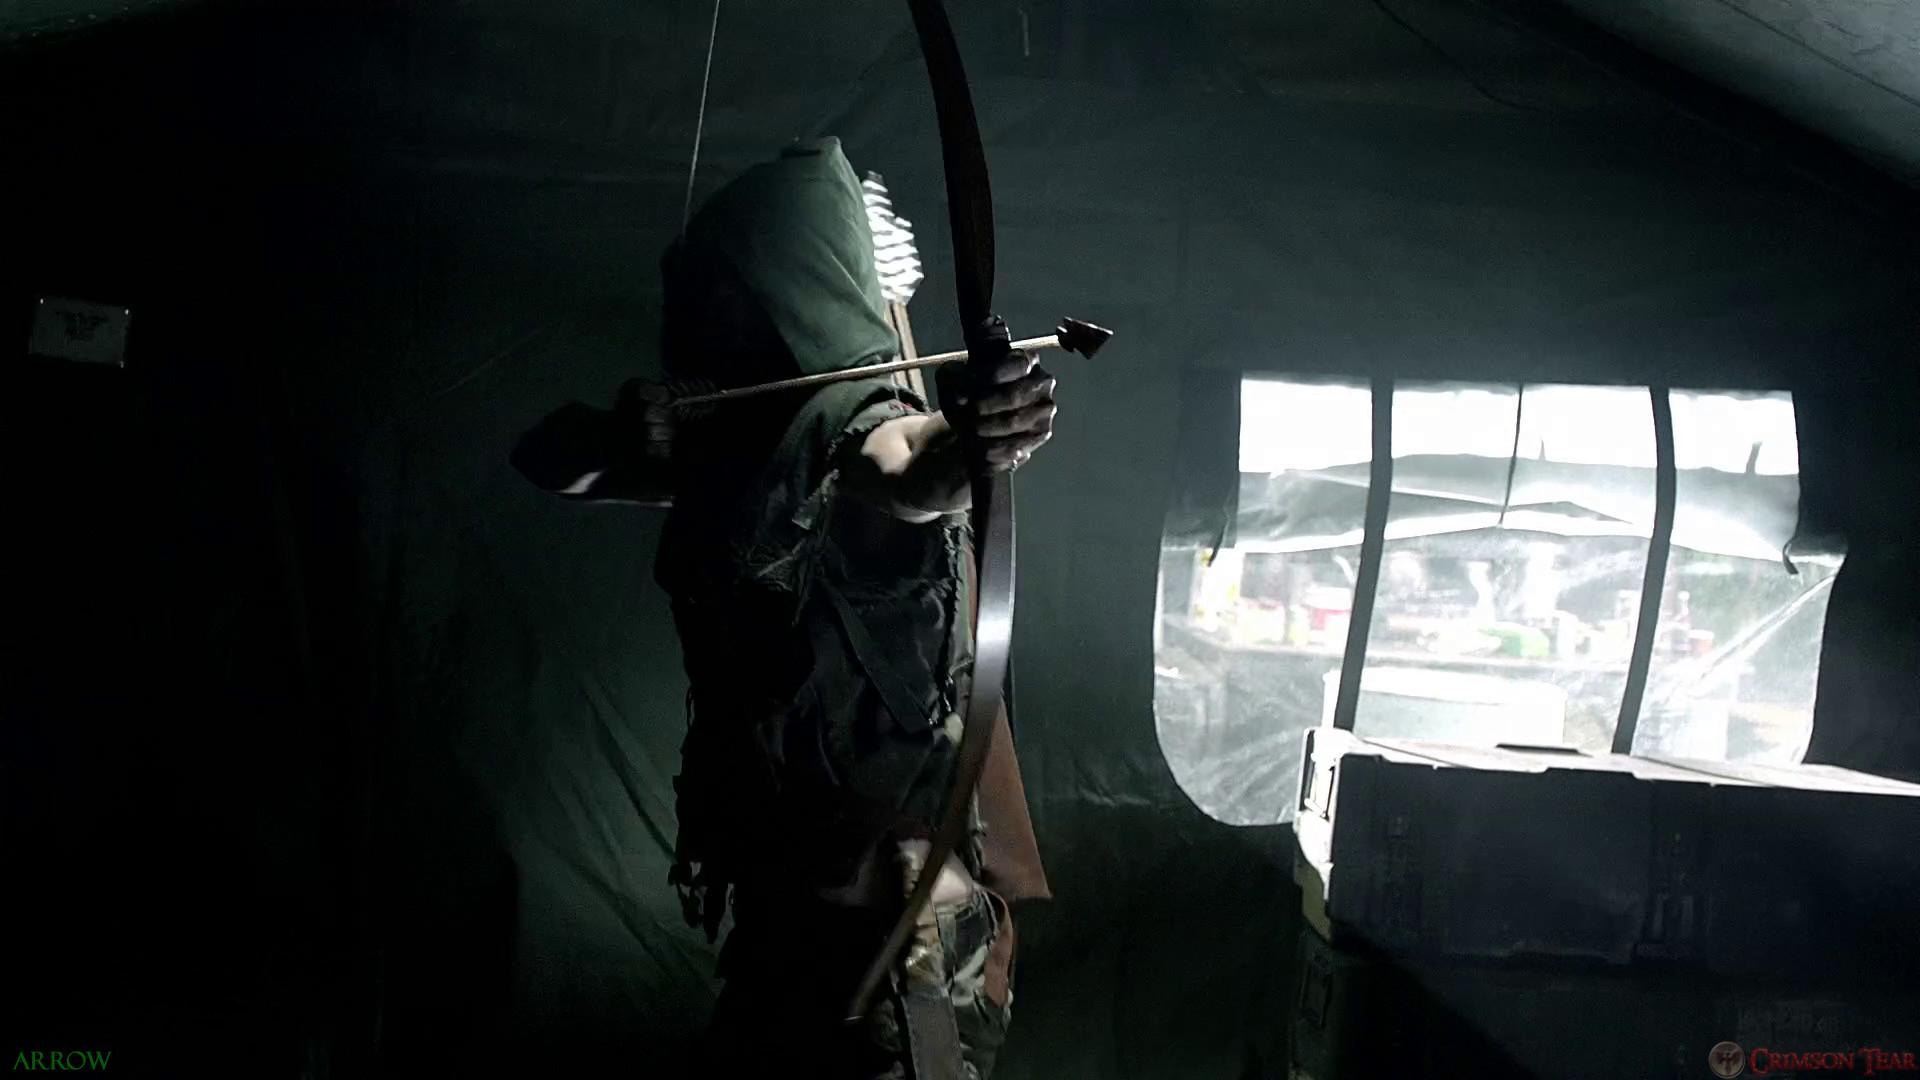 Green Arrow Wallpaper Cw Arrow season 1: the green yao